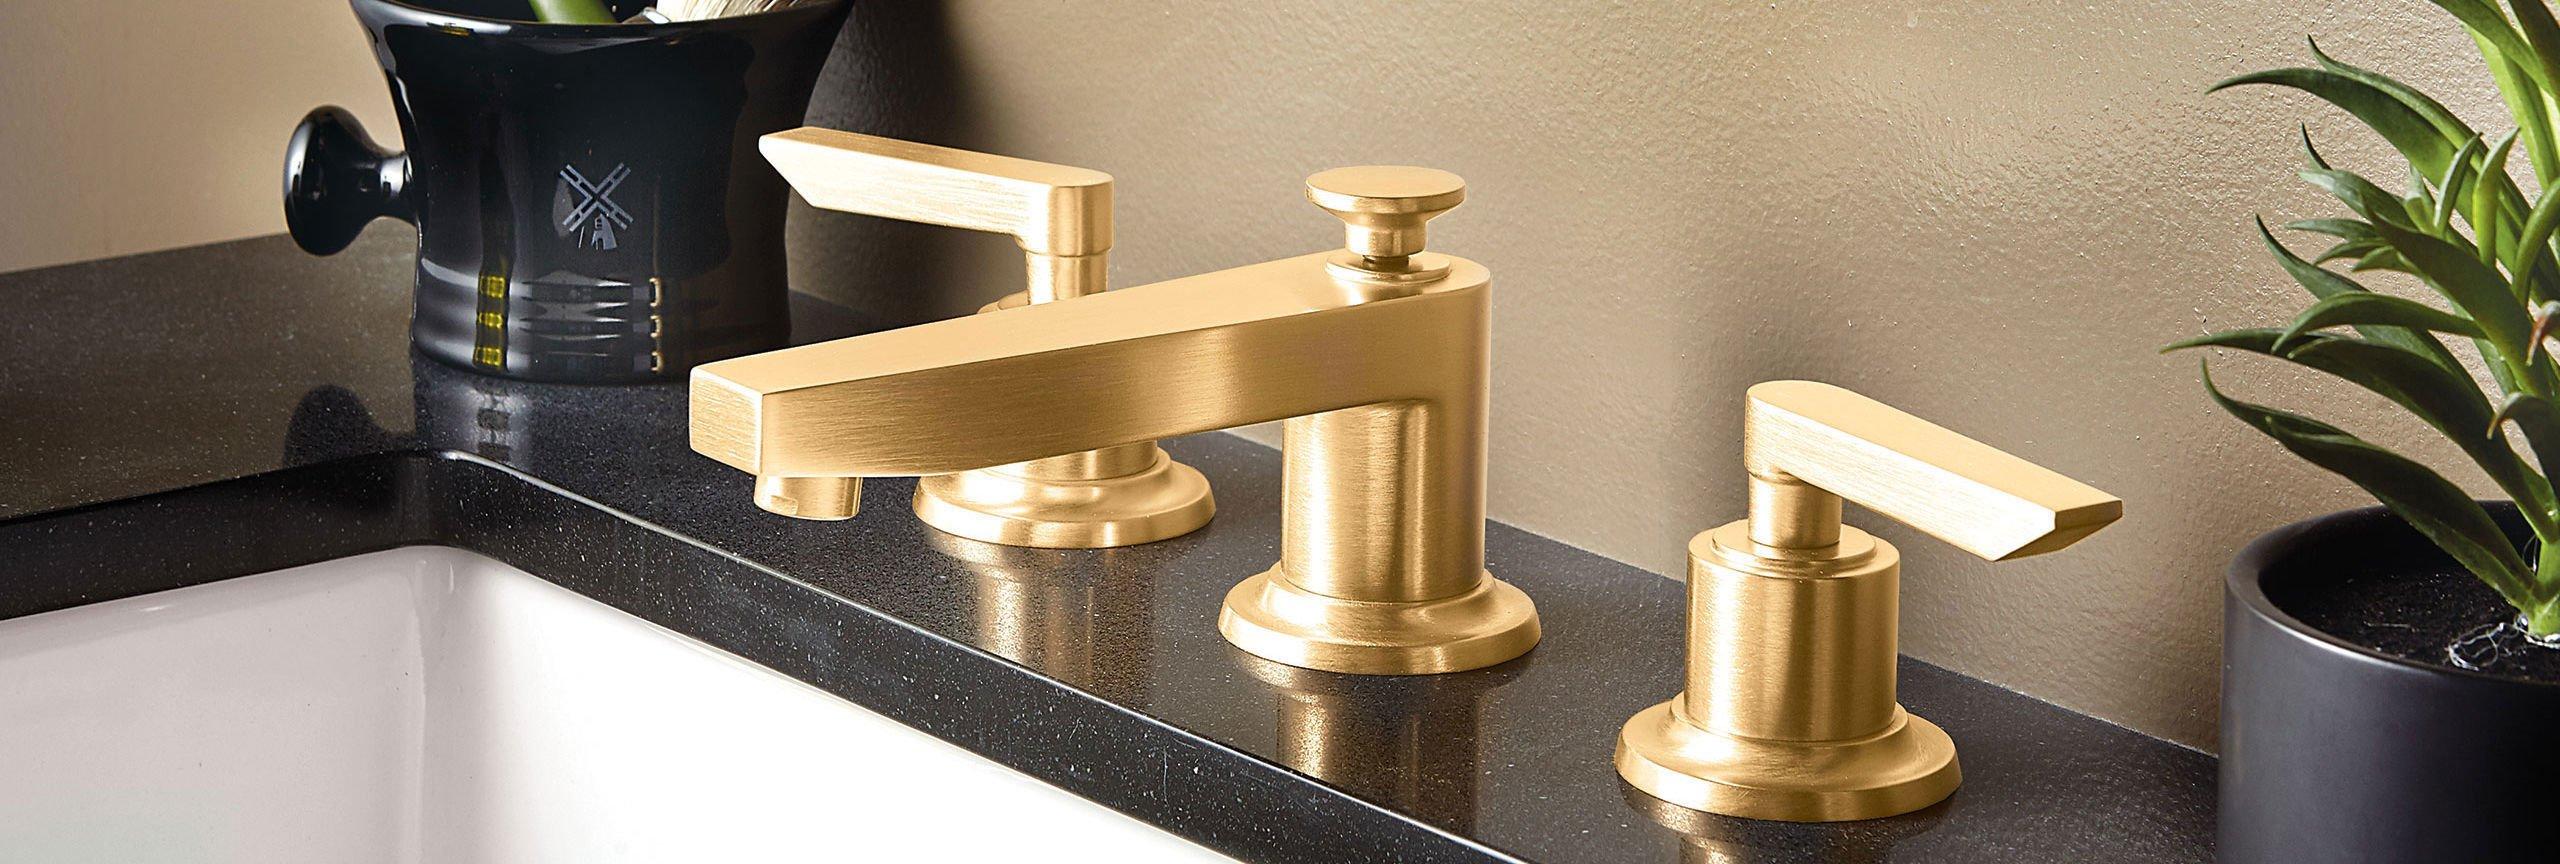 bathroom series rincon bay widespread faucet in satin gold